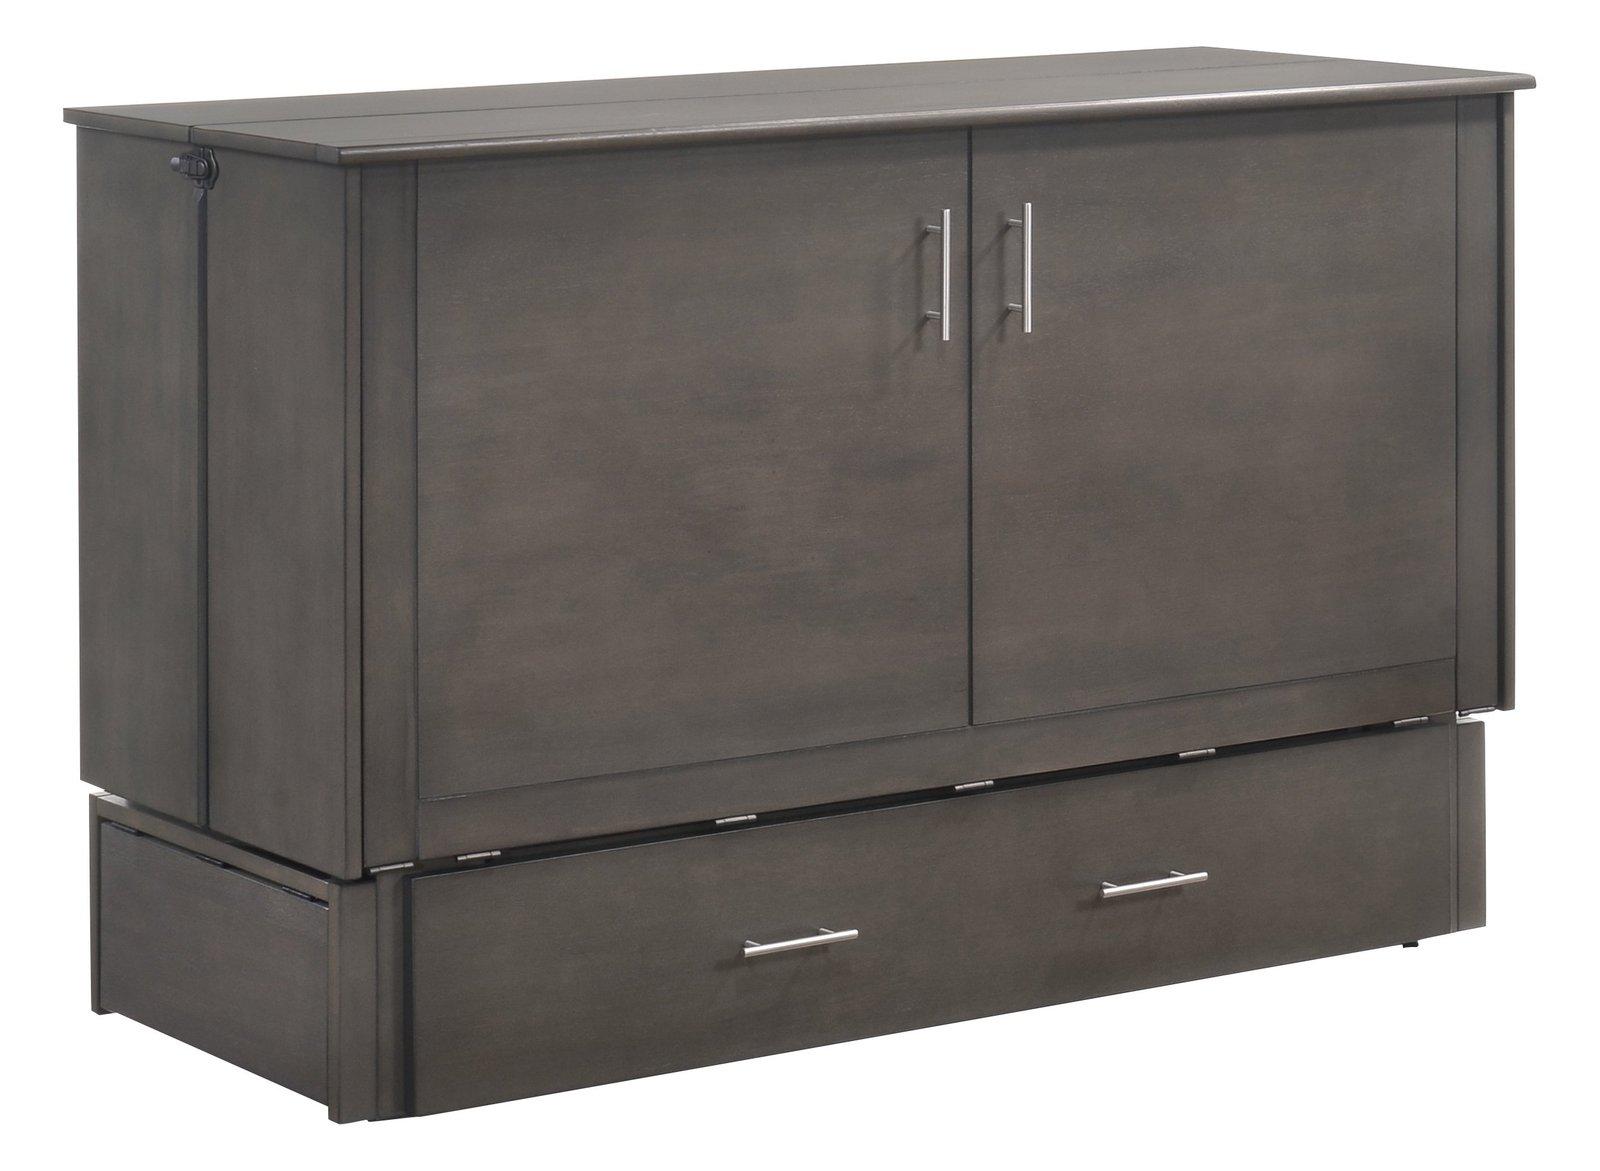 Night& Day Furniture Sagebrush Murphy Cabinet Bed with Mattress, Stonewash,  Beds& Bed Frames